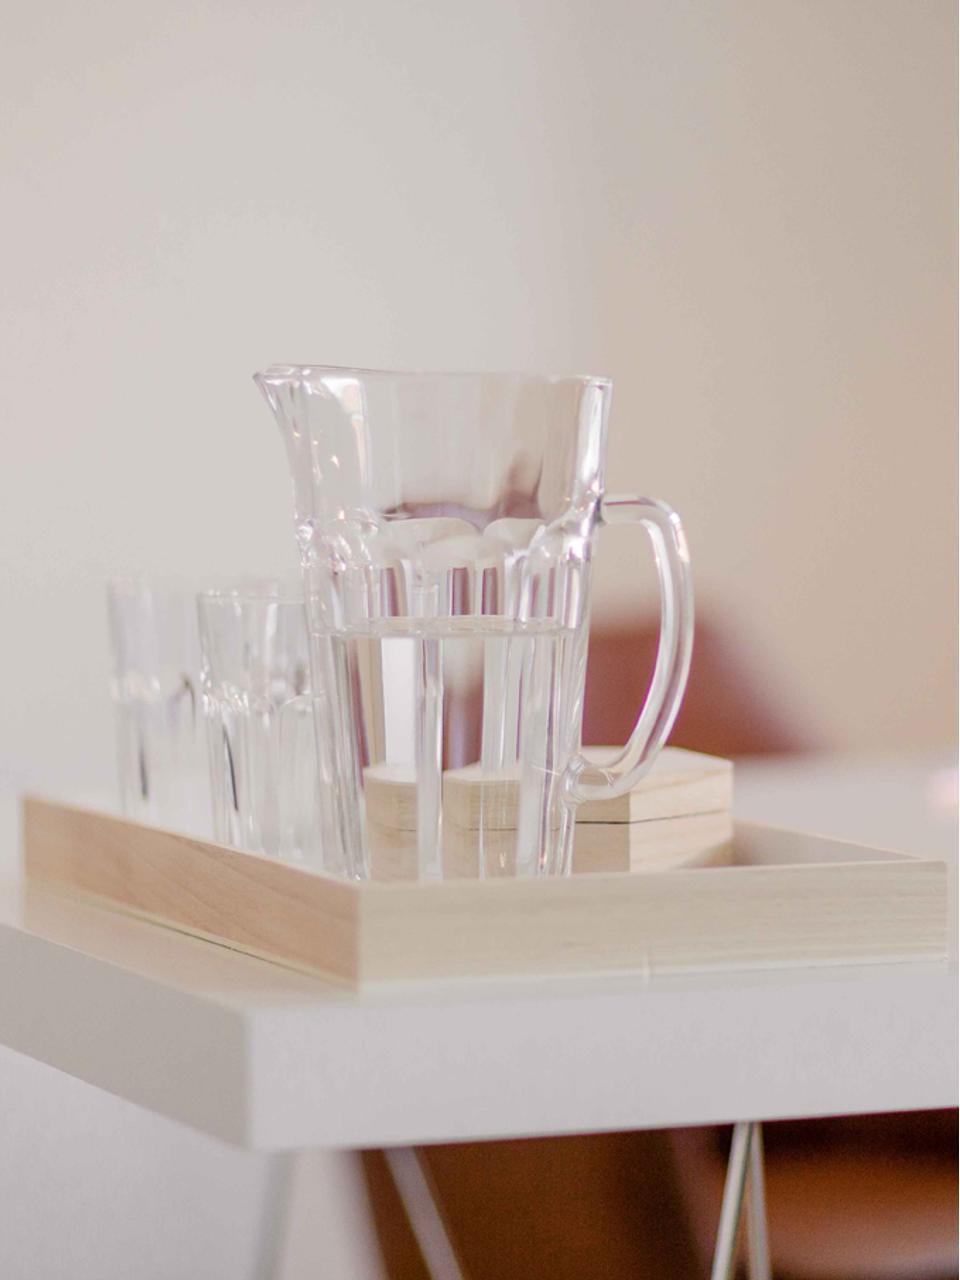 Brocca Rock con bicchieri 7pz, Vetro, Trasparente, Set in varie misure